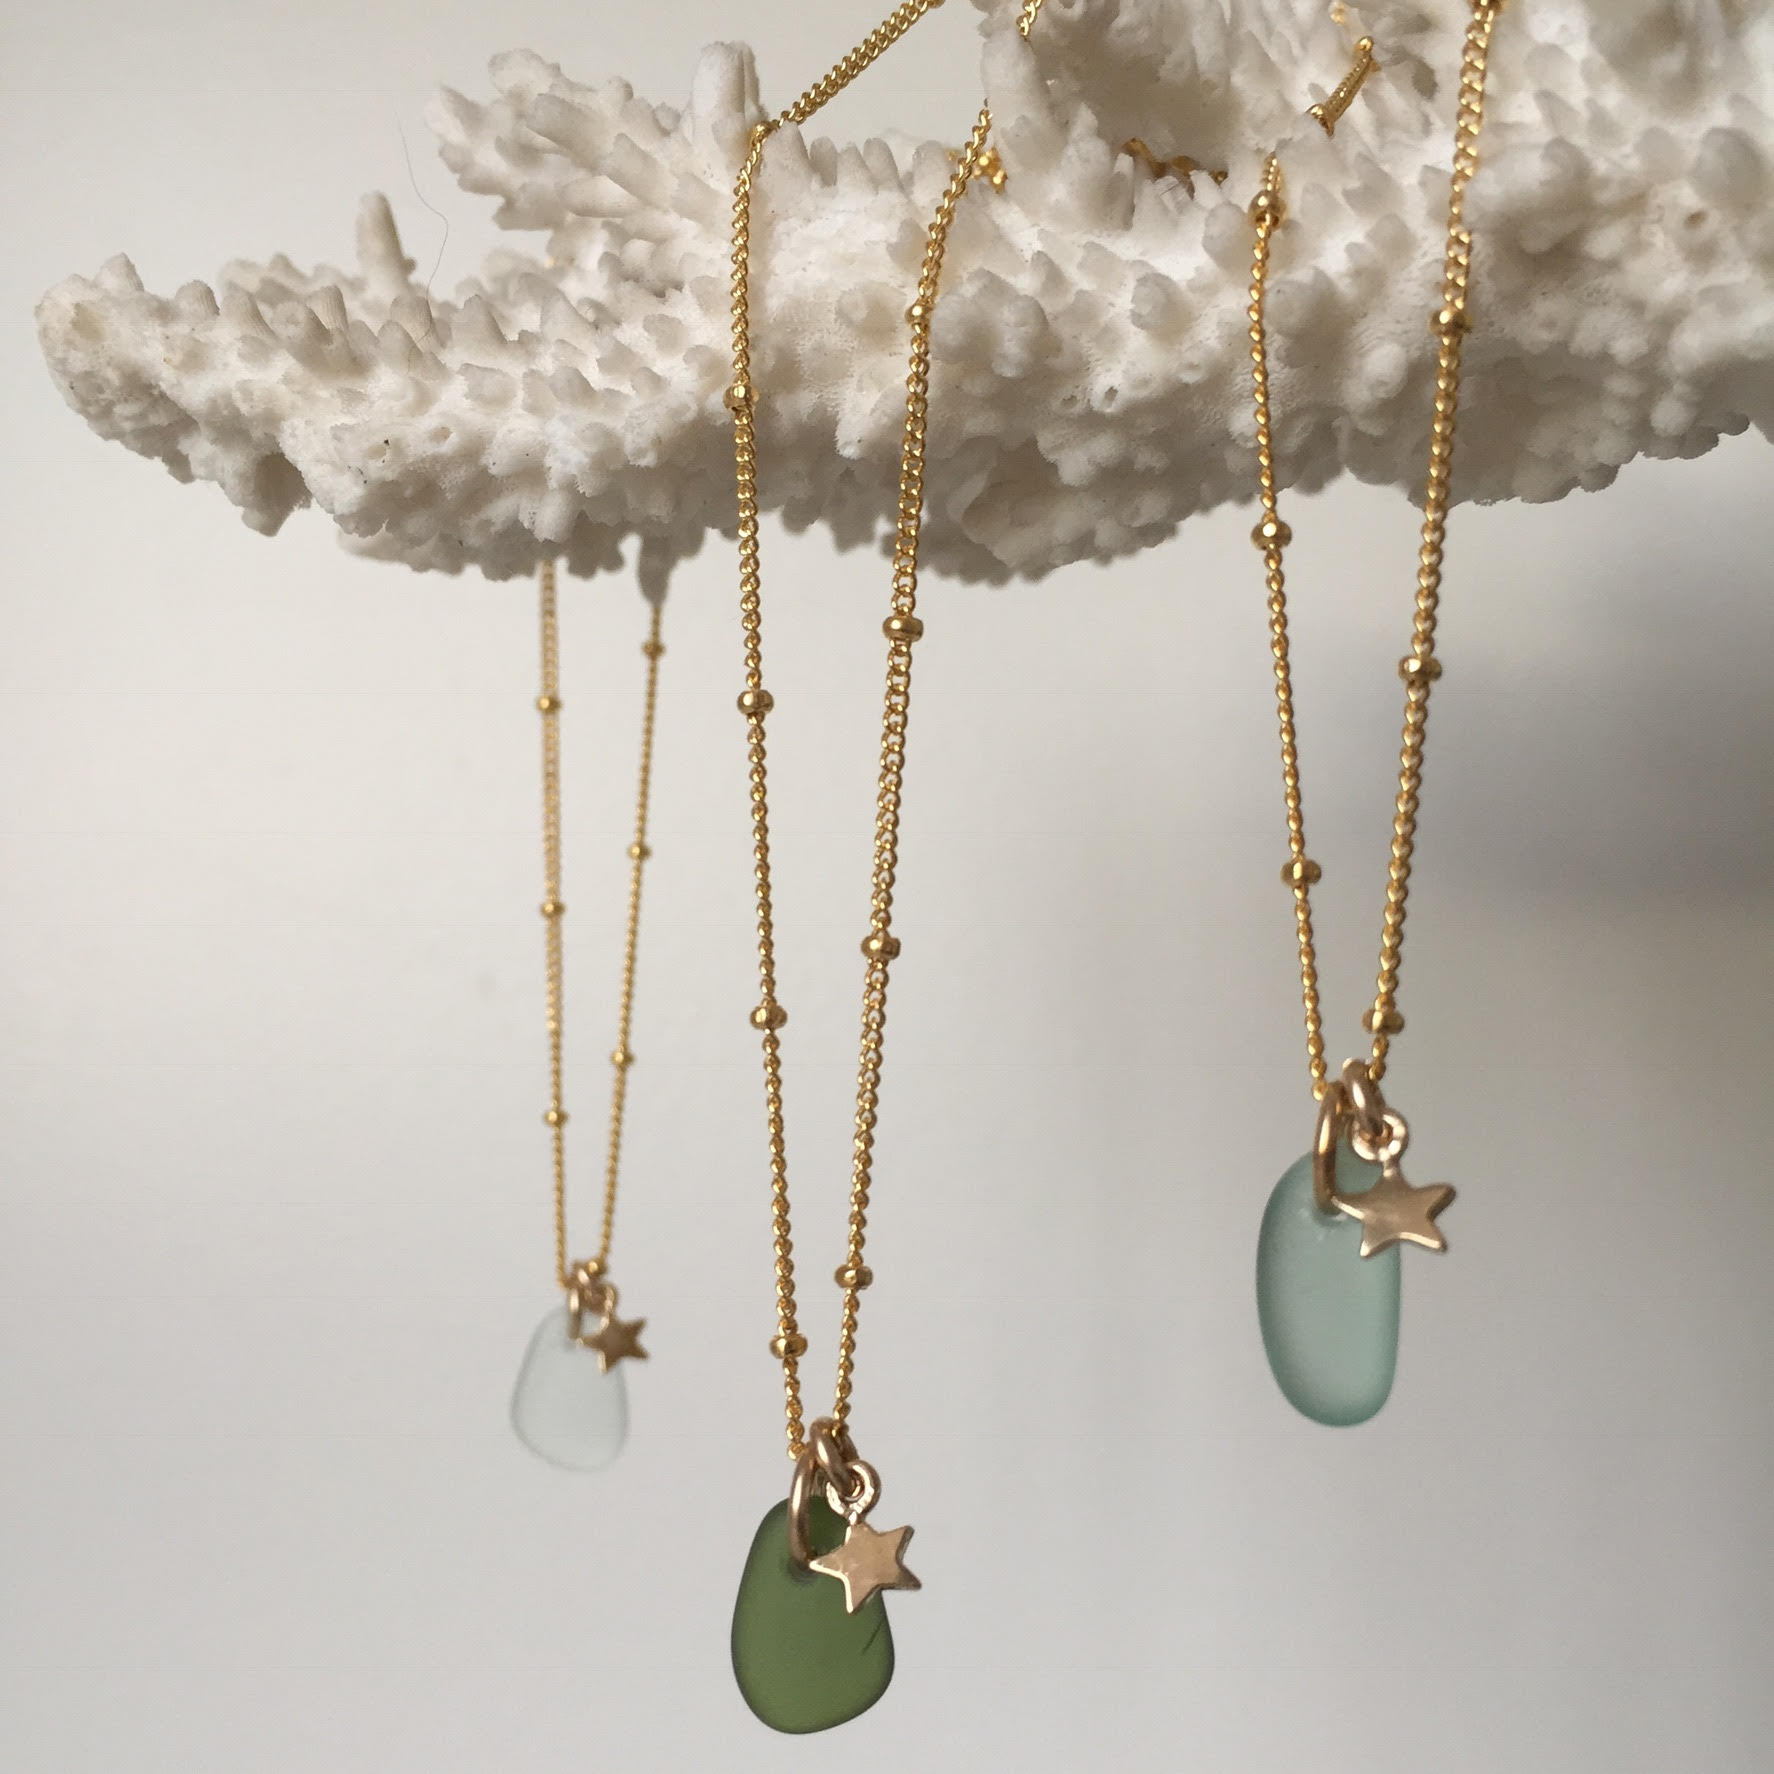 Drift Jewellery - Christmas is coming